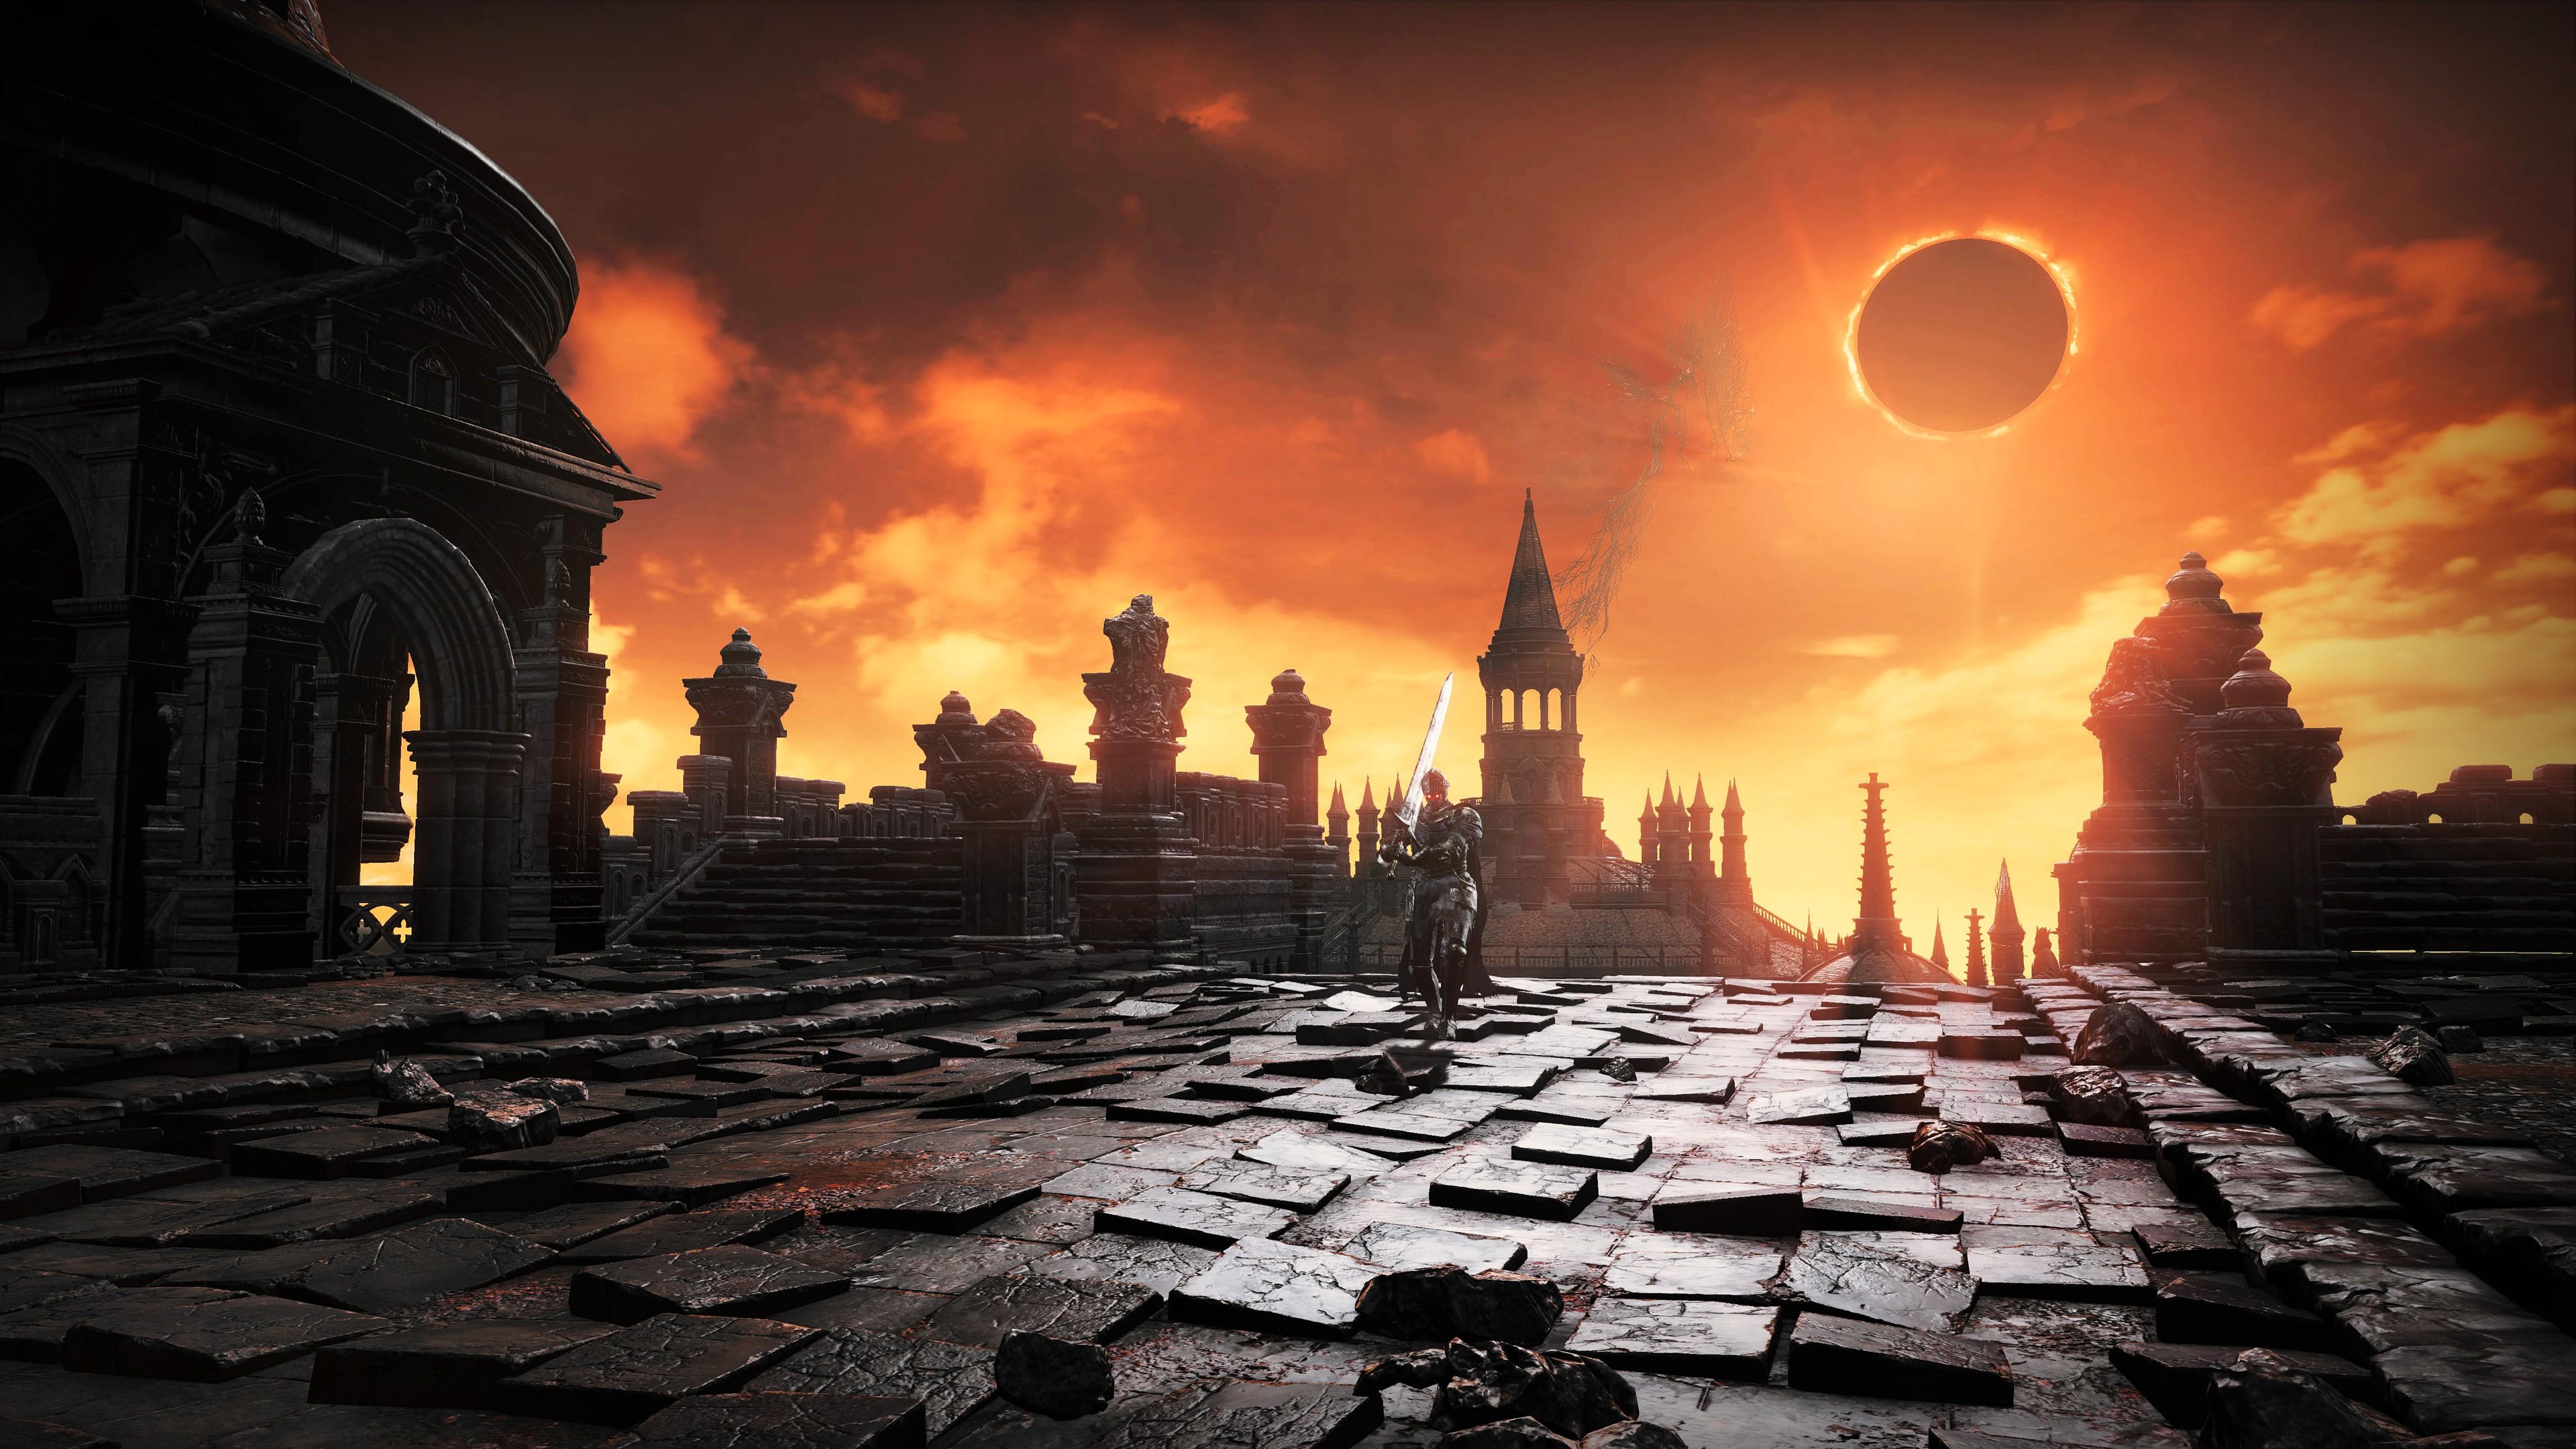 Dark Souls Background 1920x1080: 44+ Dark Souls 3 Wallpapers ·① Download Free Full HD